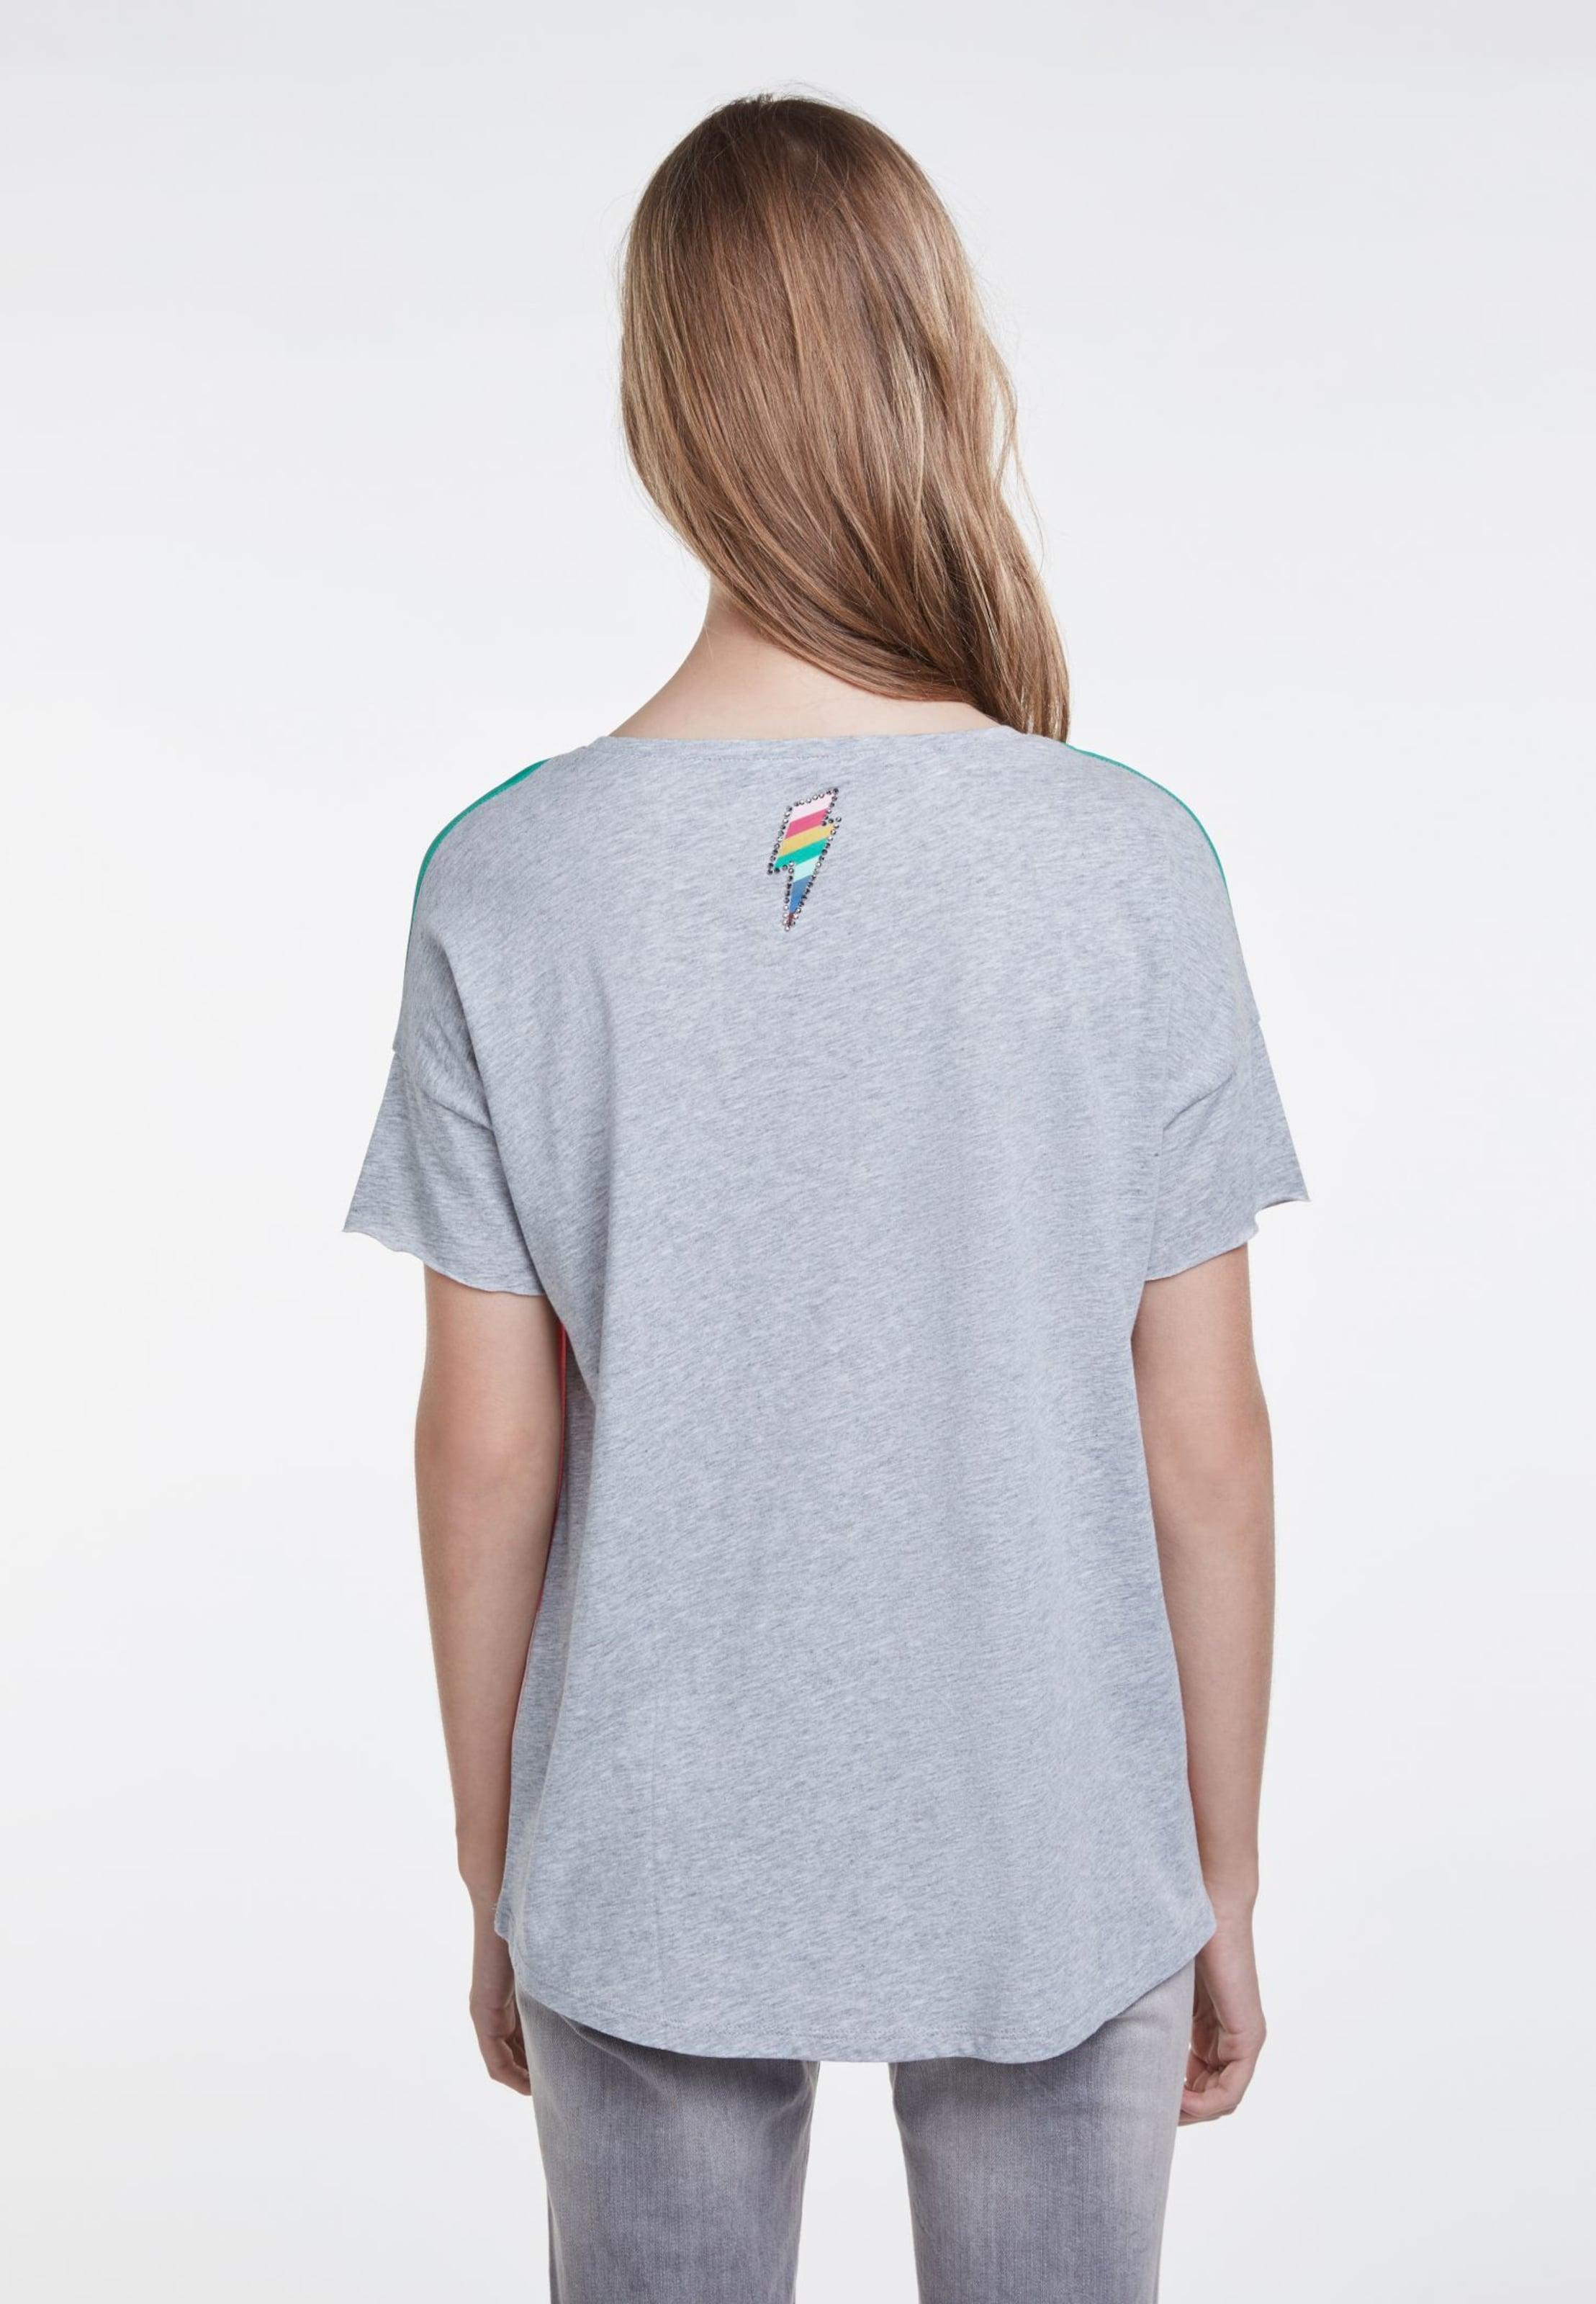 Shirt In Oui Shirt GrauMischfarben Oui In rBoCedx